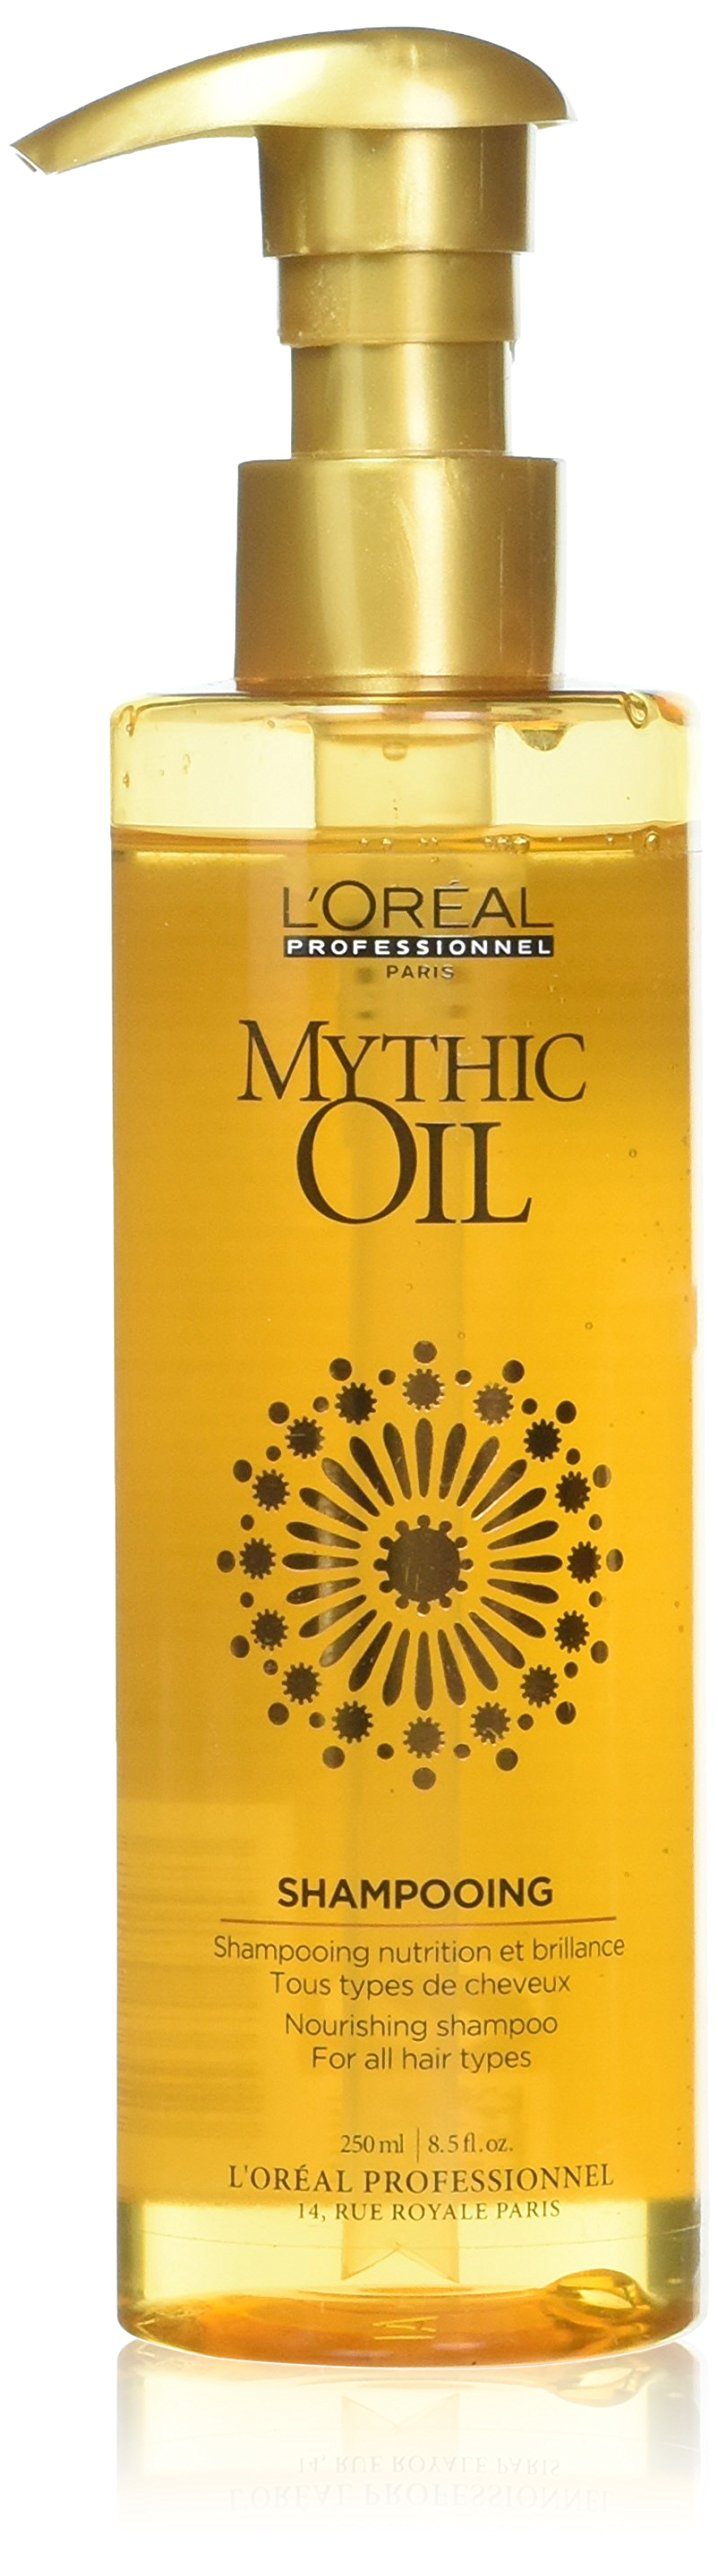 L'Oreal Professional Mythic Oil Shampoo 8.5 oz